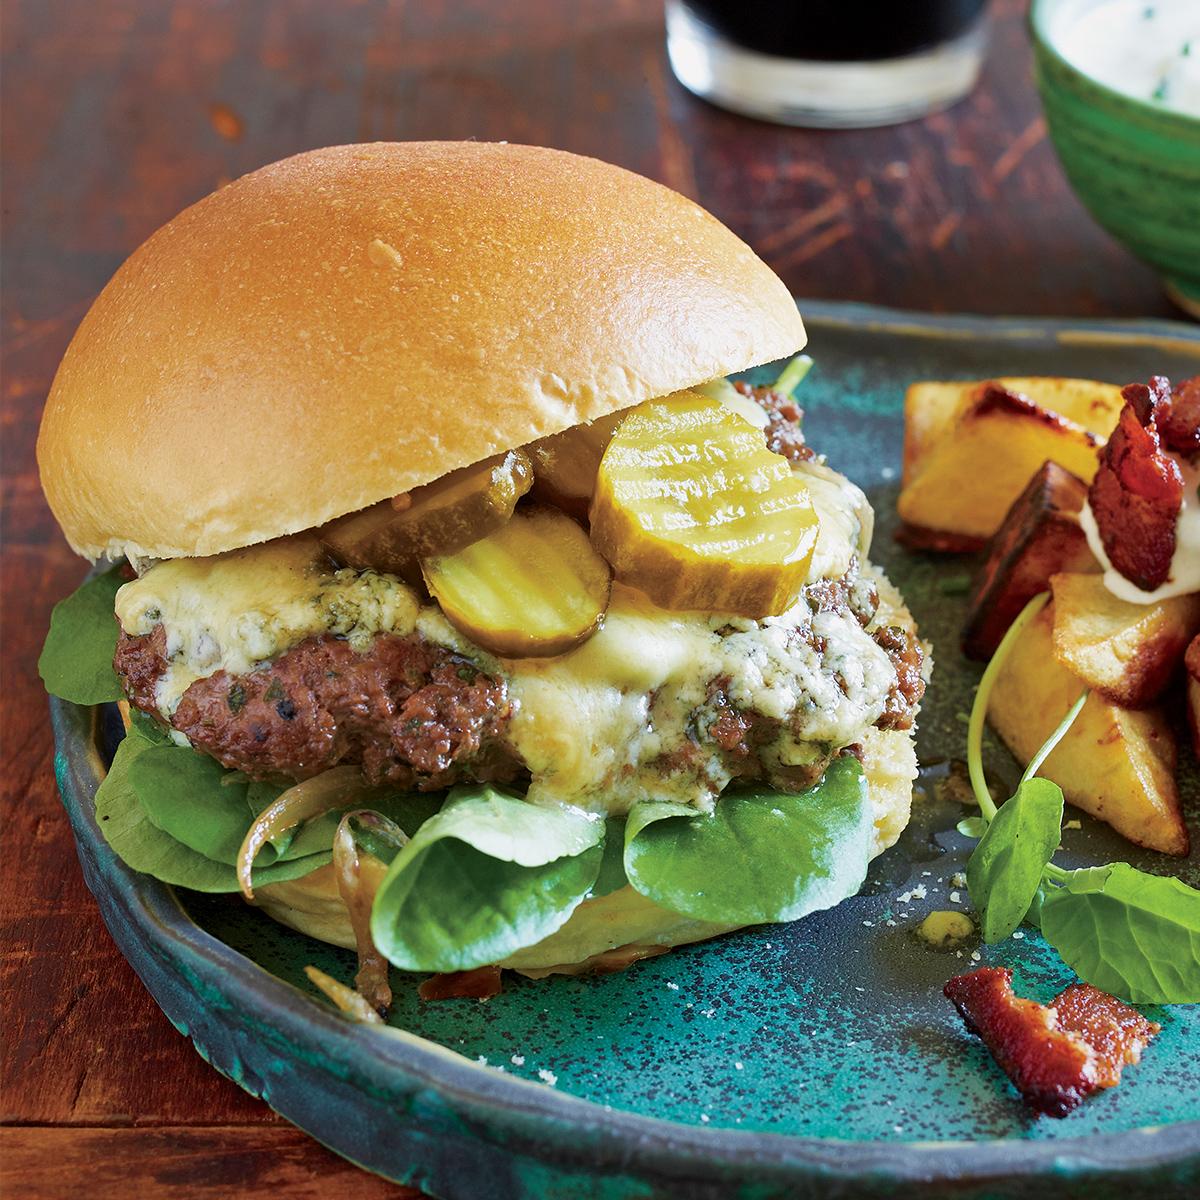 garlic sherry burgers with stilton pub browns with horseradish sauce